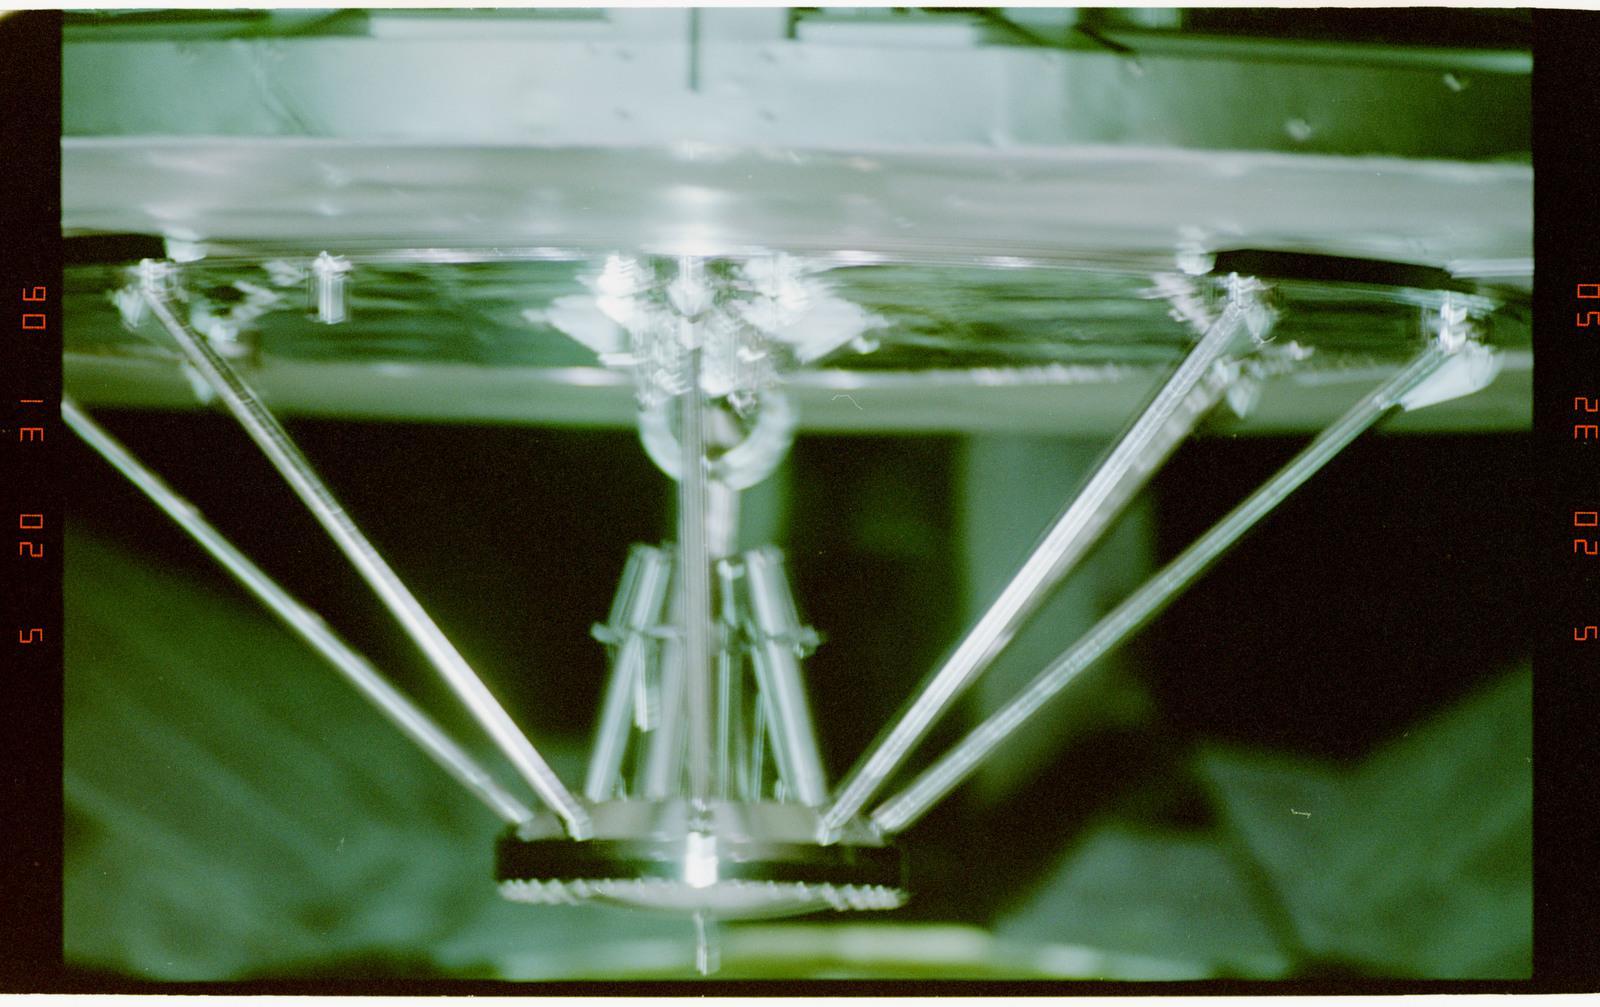 STS060-16-033 - STS-060 - Various close-up views of the Wake Shield Facility (WSF)